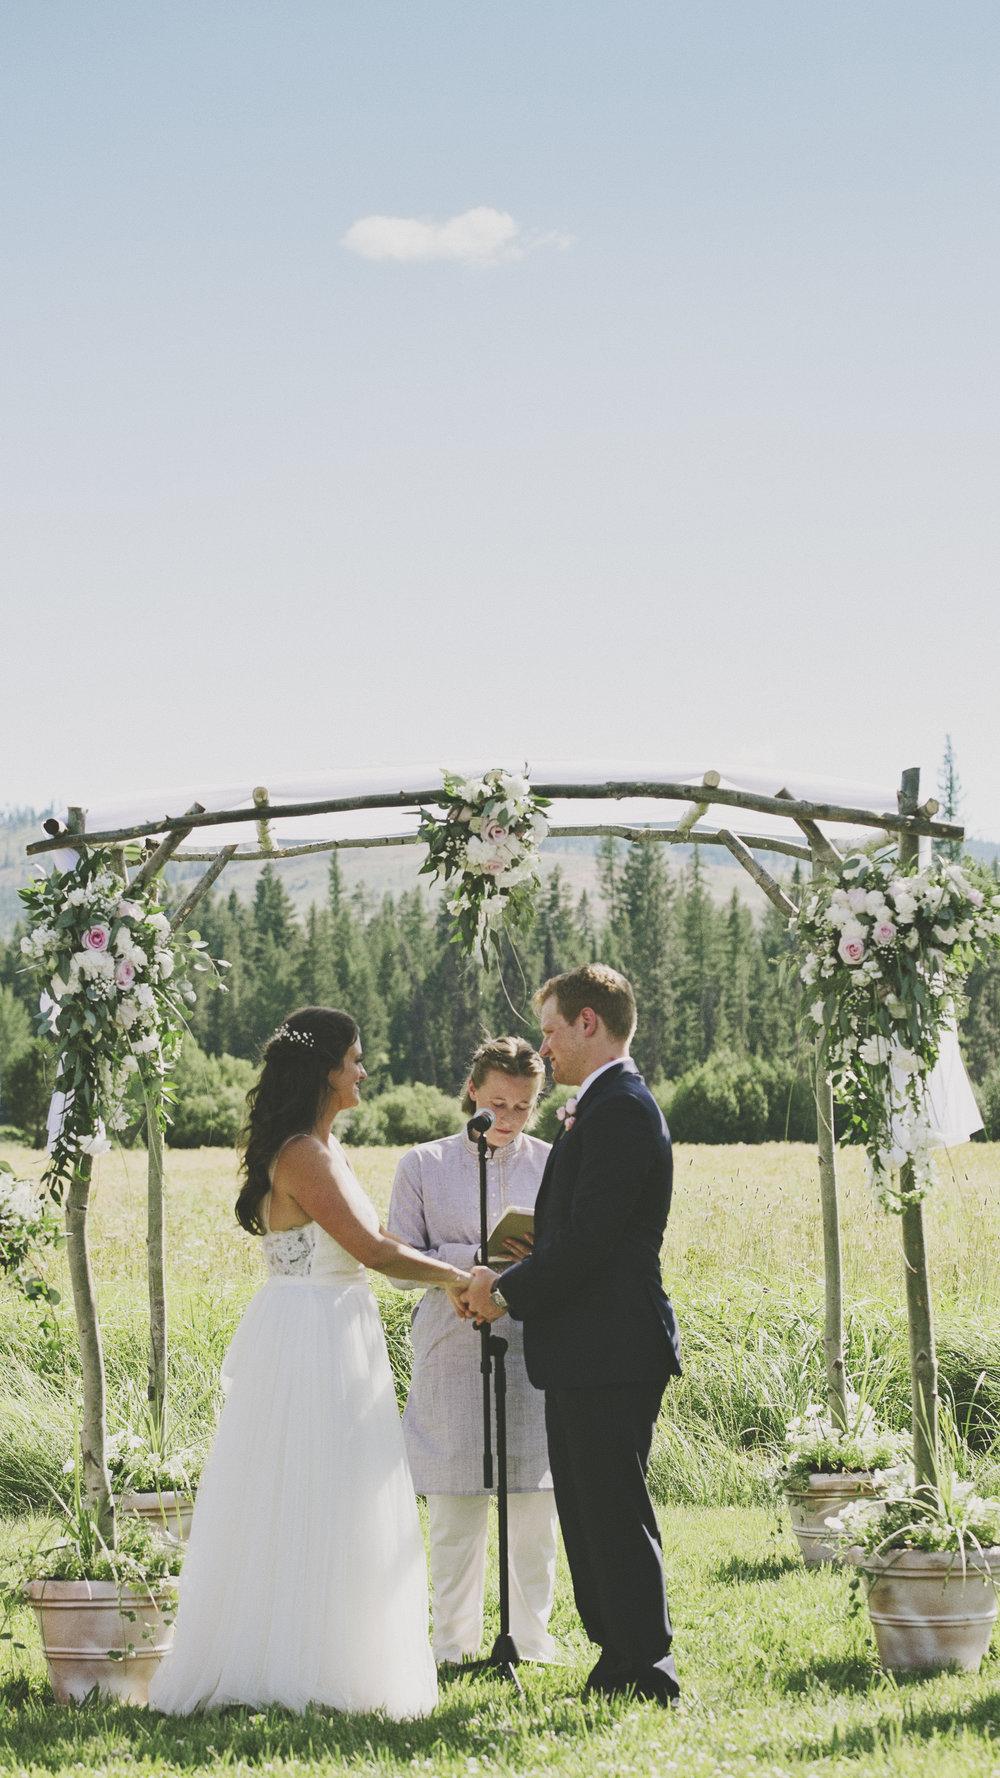 Chloe Hurwitz + Kiefer Martin Wedding_Grey Wolf Ranch_Kelsey Lane Photography1609 copy.jpg